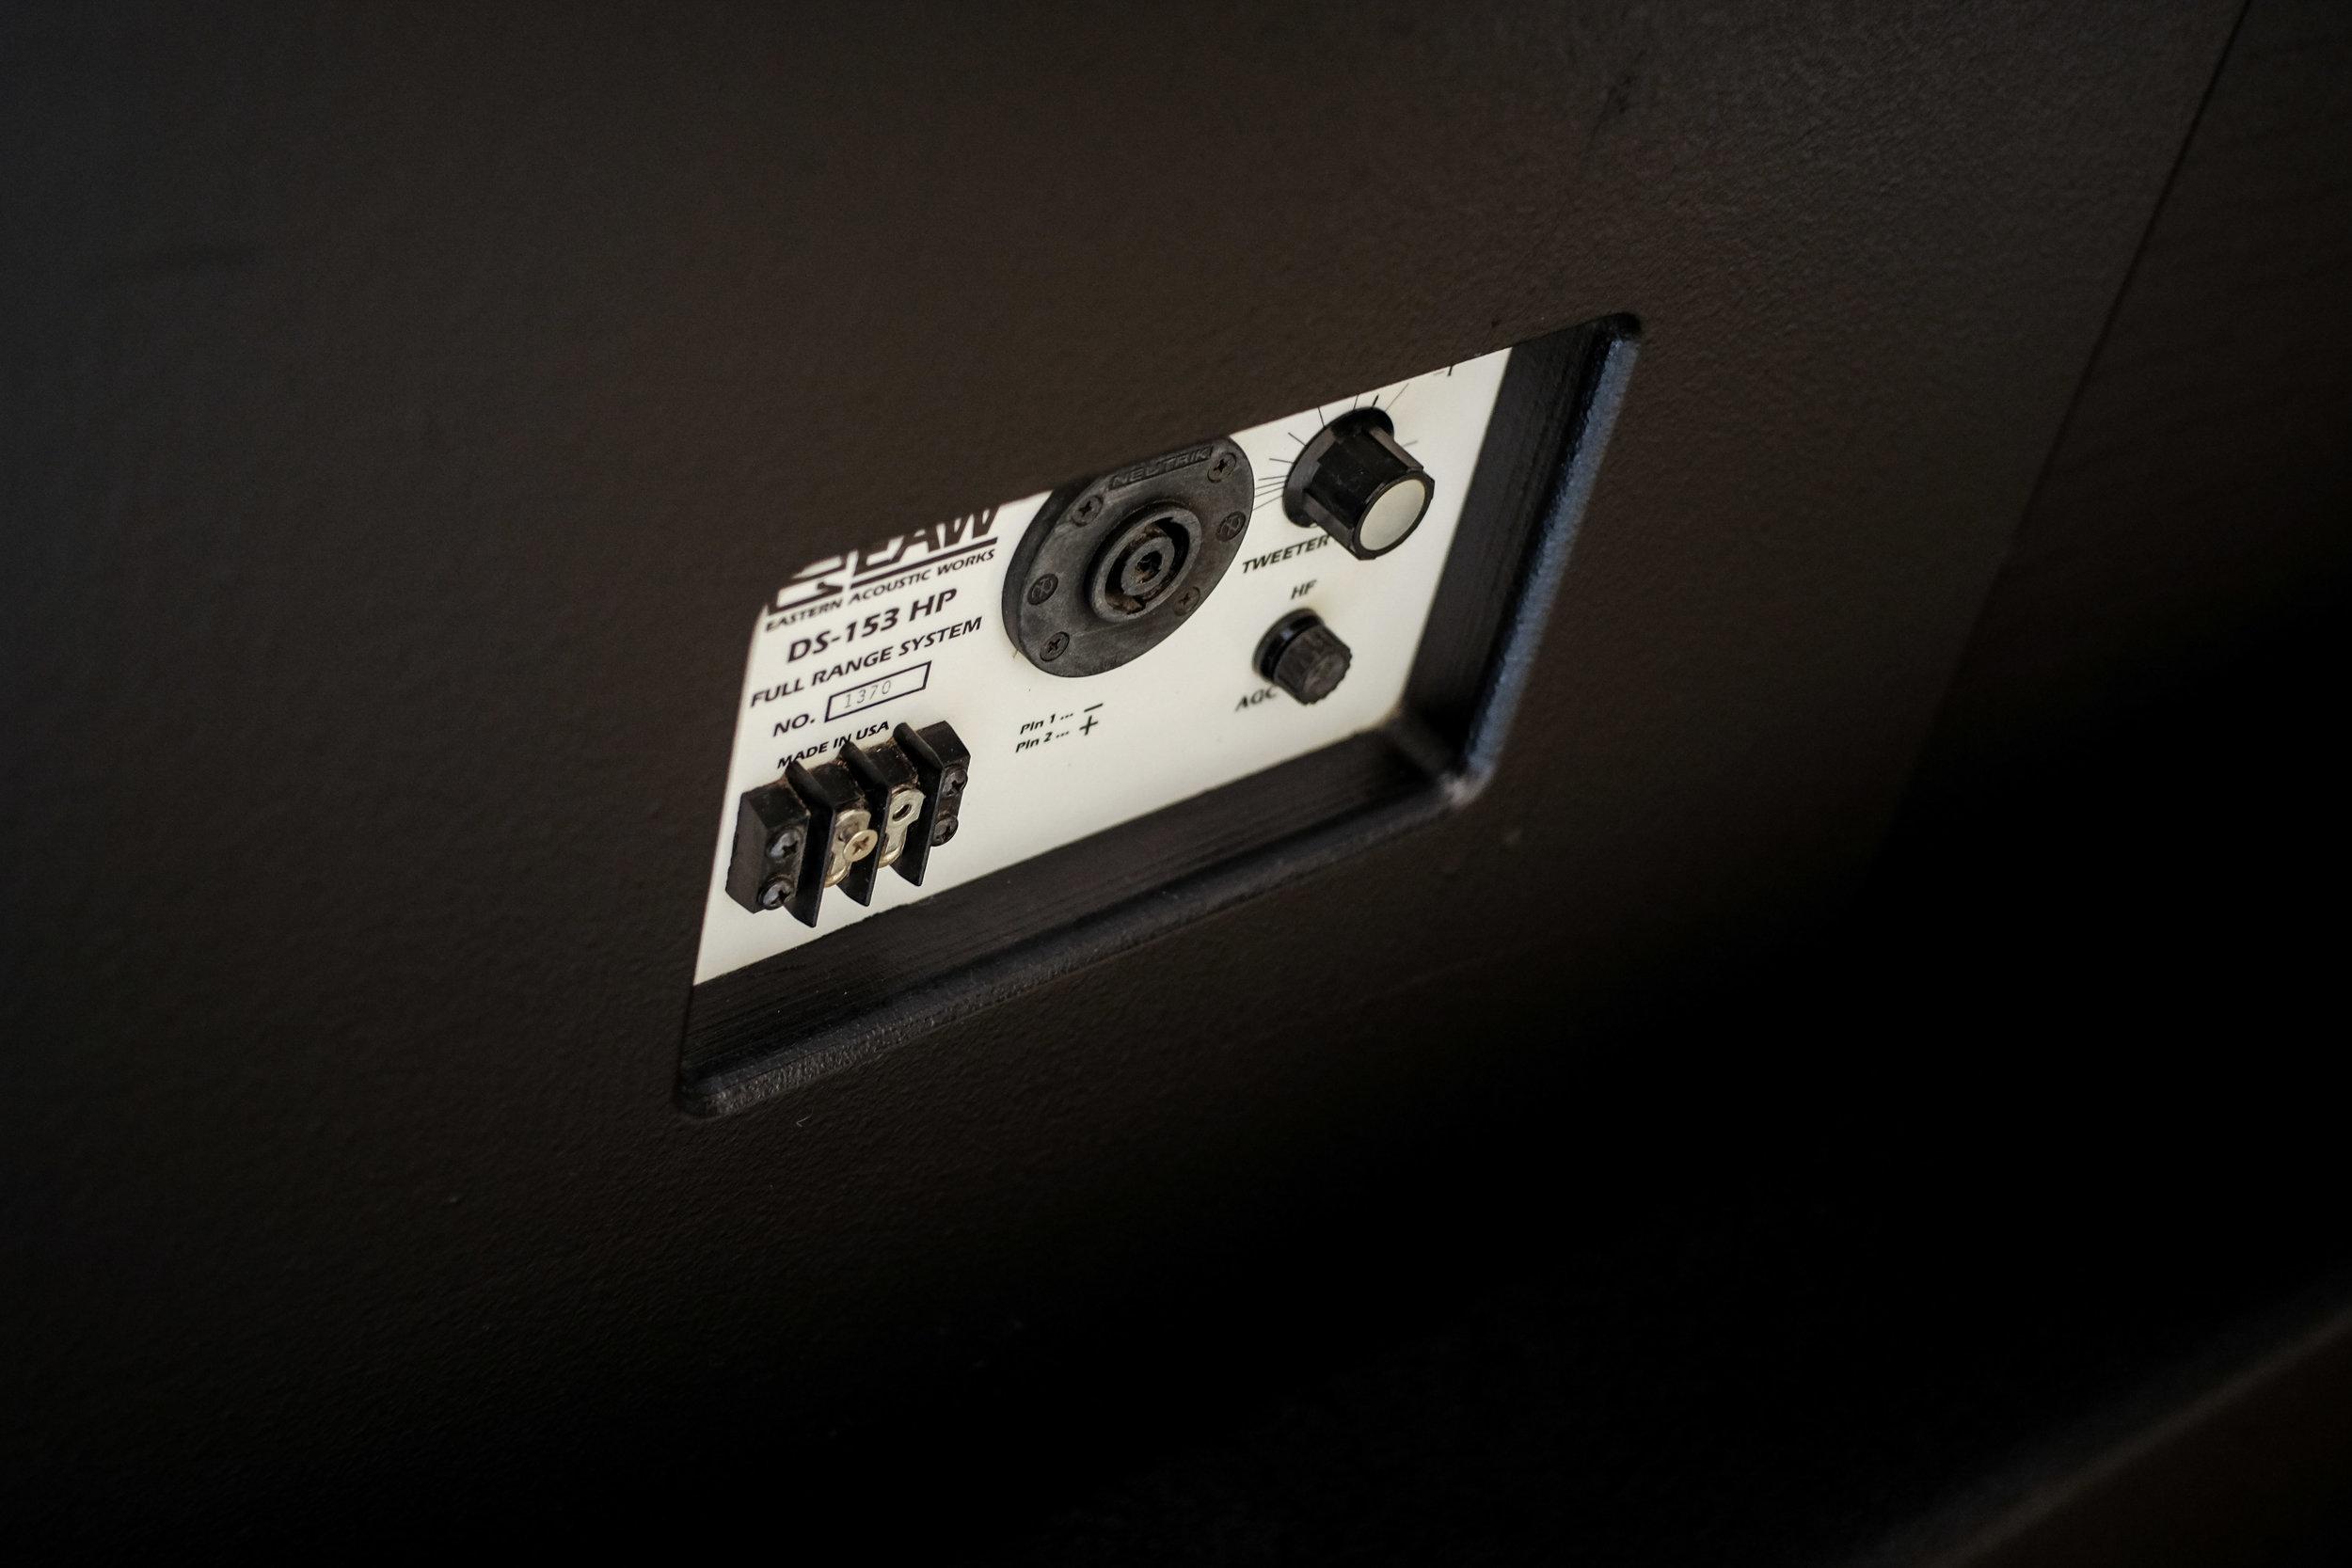 EAW DS-153HP Rear 1.jpg